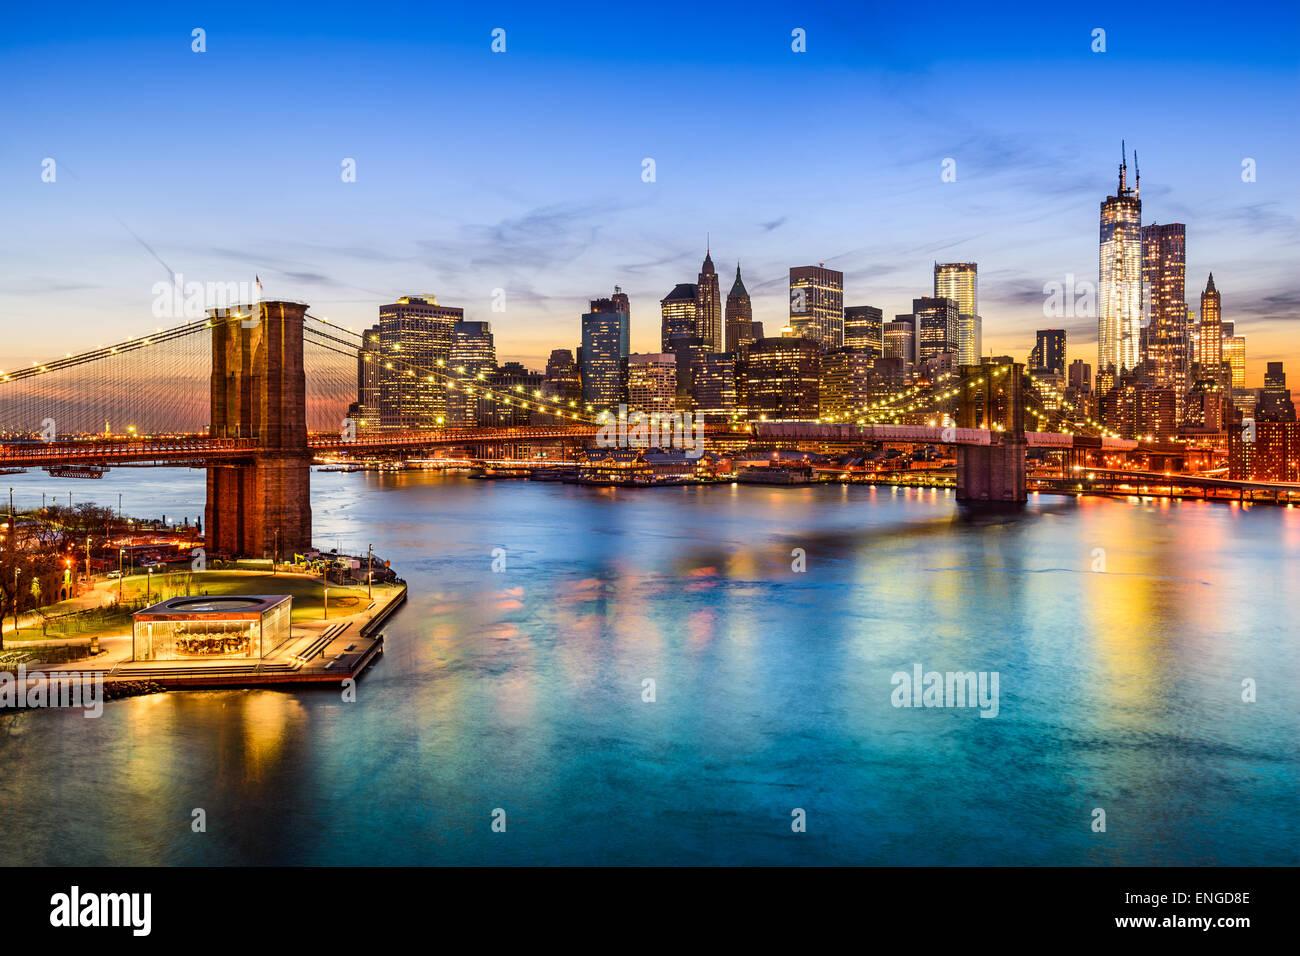 New York City, USA skyline over East River and Brooklyn Bridge. - Stock Image